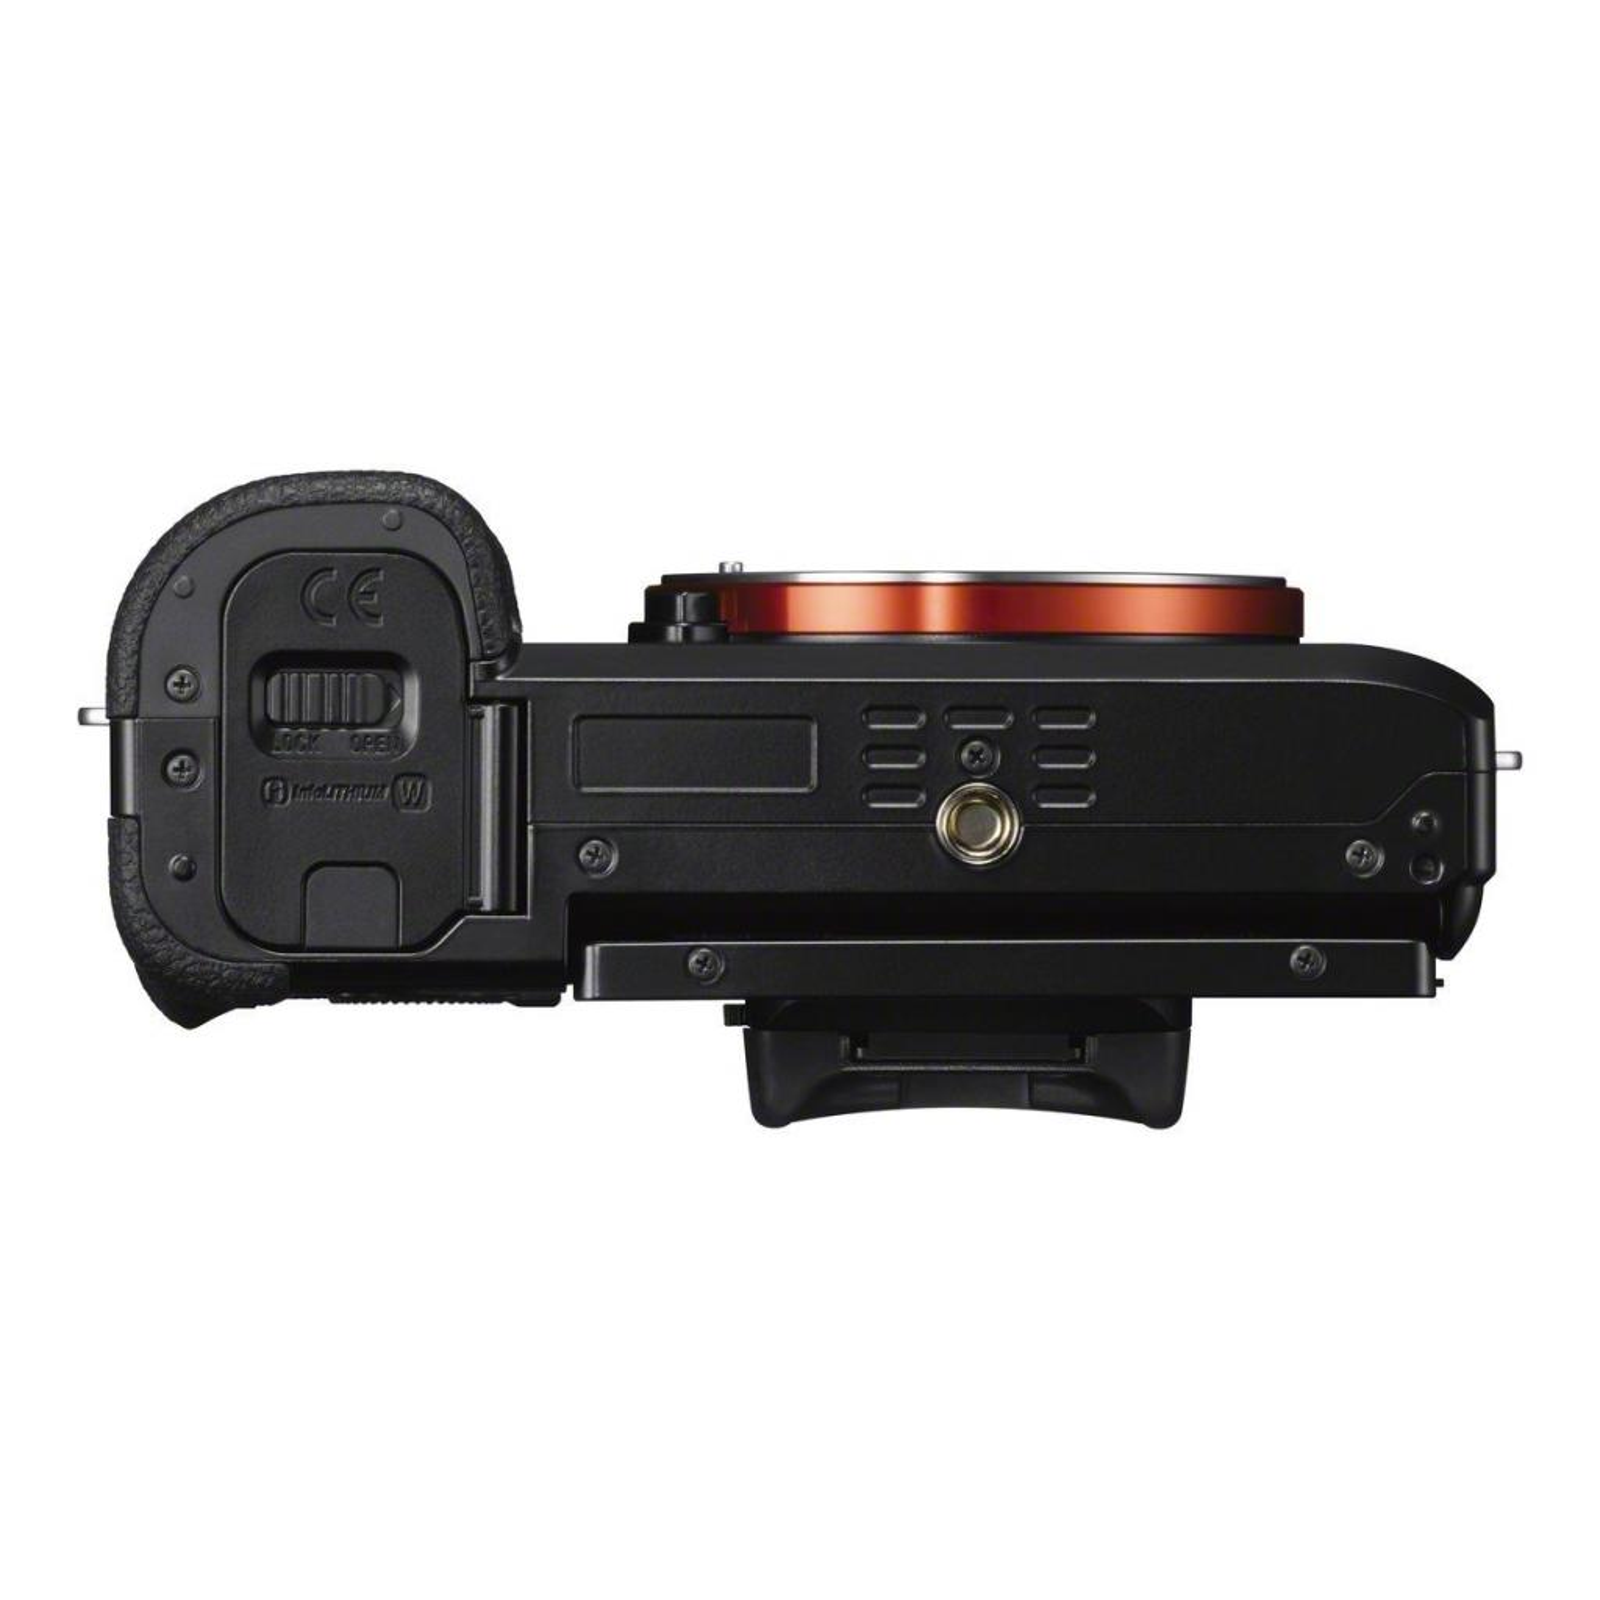 Цифровой фотоаппарат SONY Alpha 7 body black (ILCE7B.RU2) изображение 12